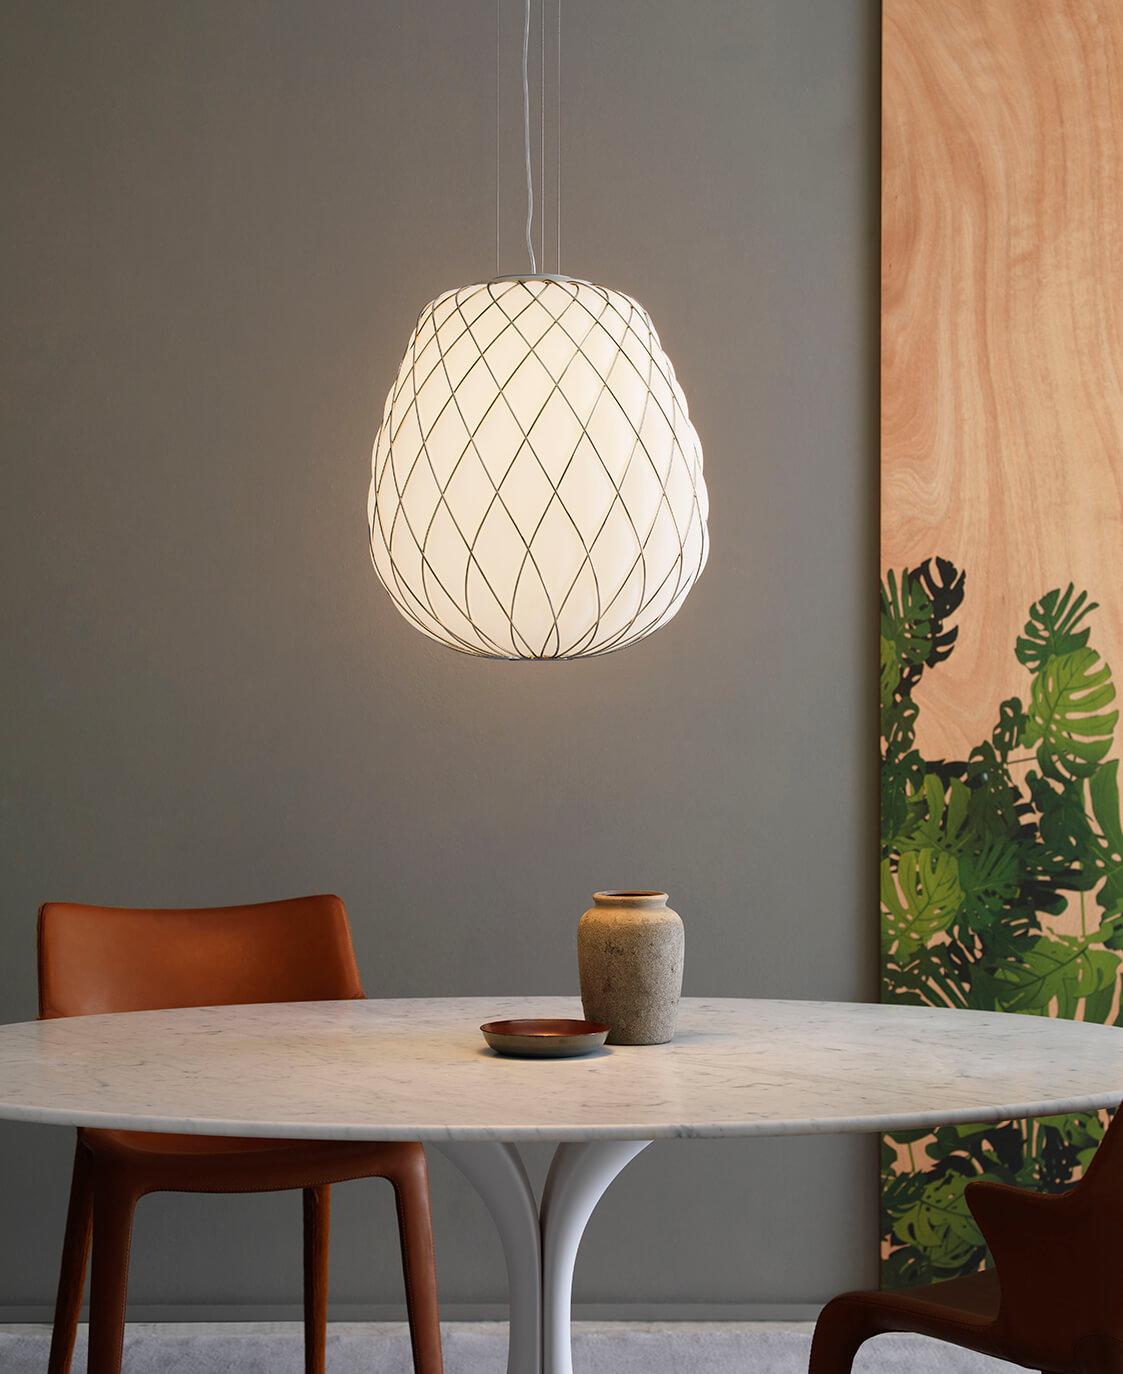 Radiant lighting pinecone suspension pinecone for Pinecone fontana